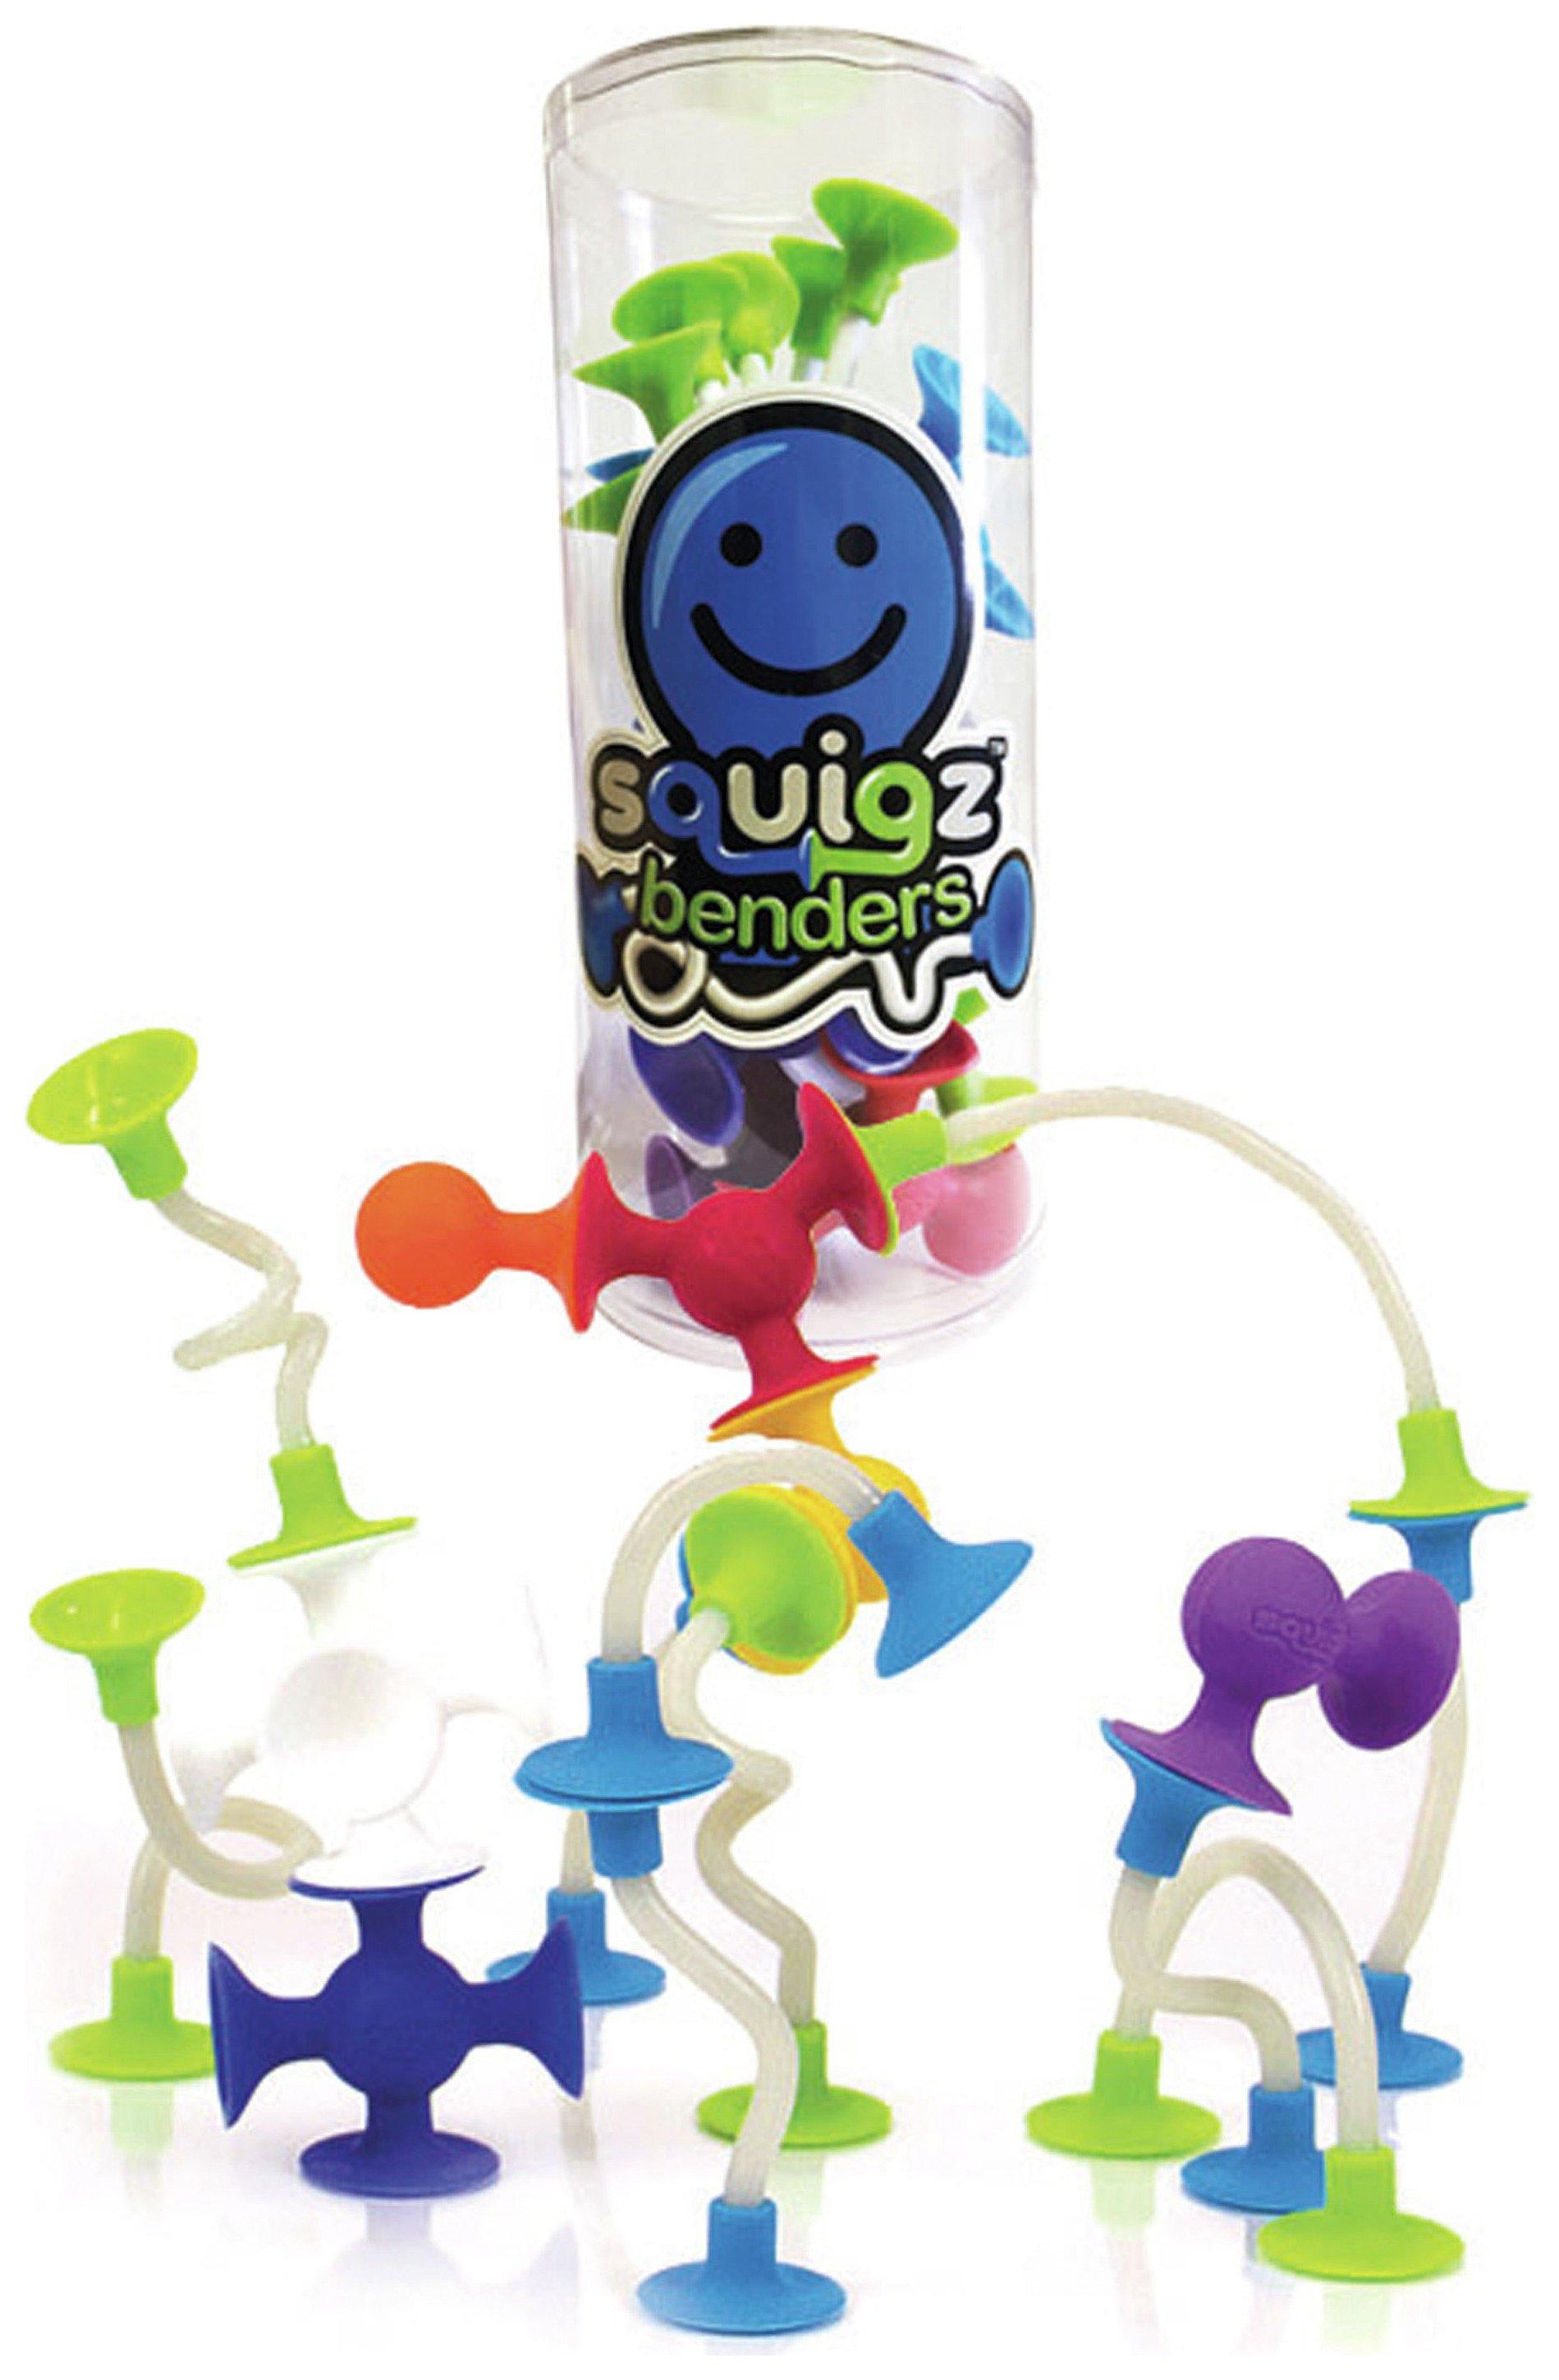 Fat Brain Toys Squigz Benders.